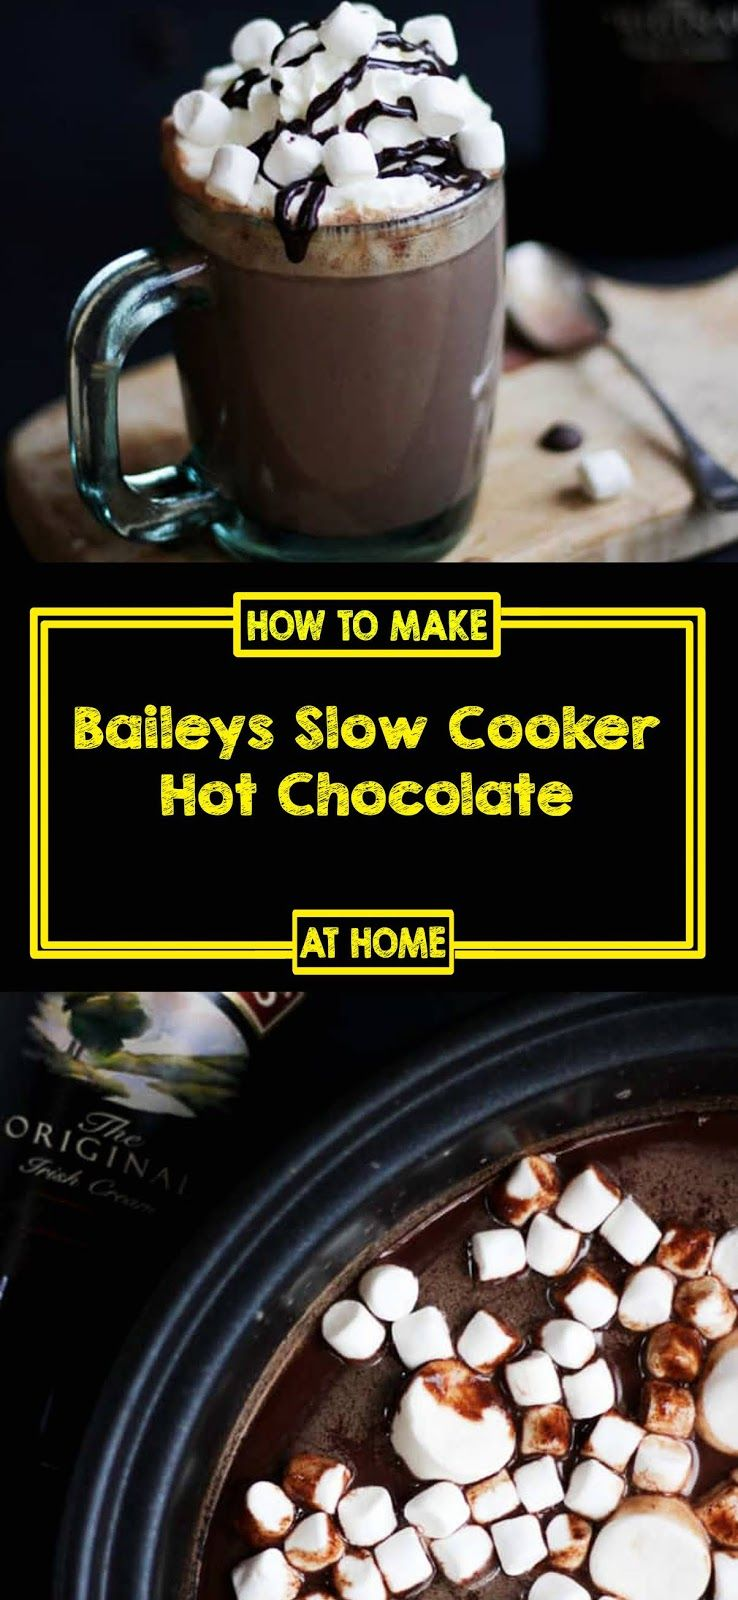 Baileys Slow Cooker Hot Chocolate